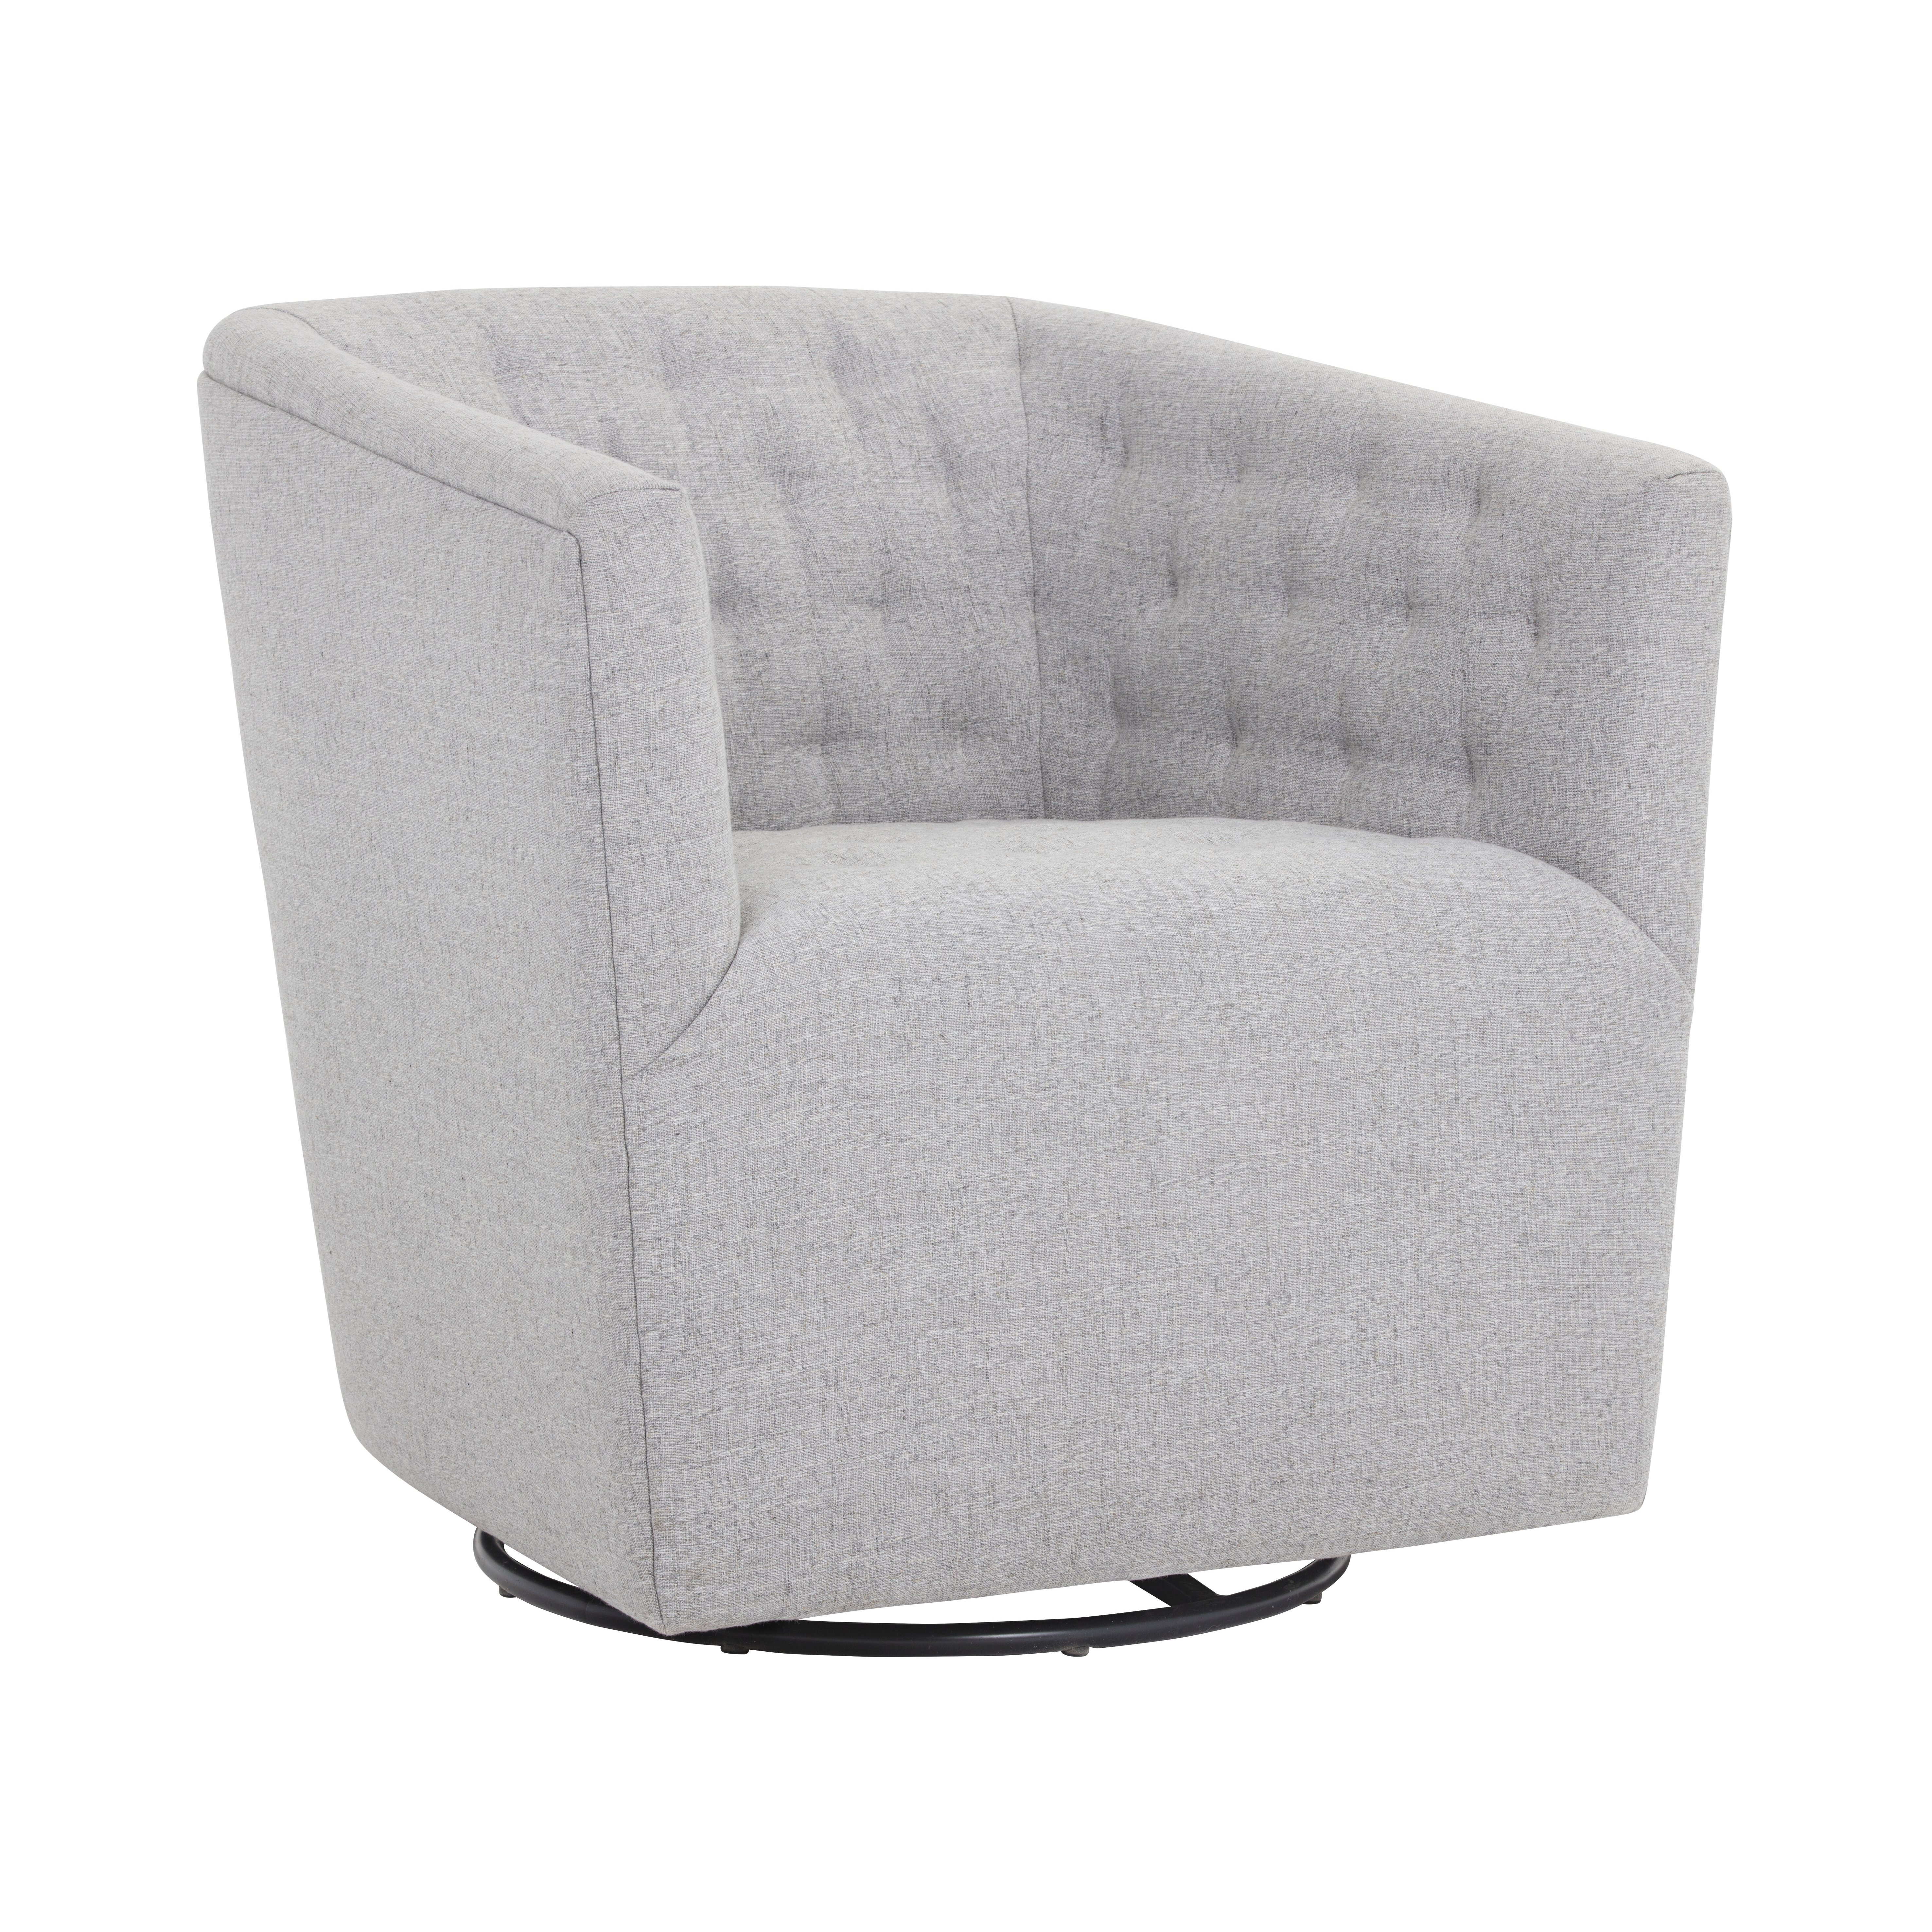 Darby Home Co Cornelius Reeves Swivel Barrel Chair Wayfair